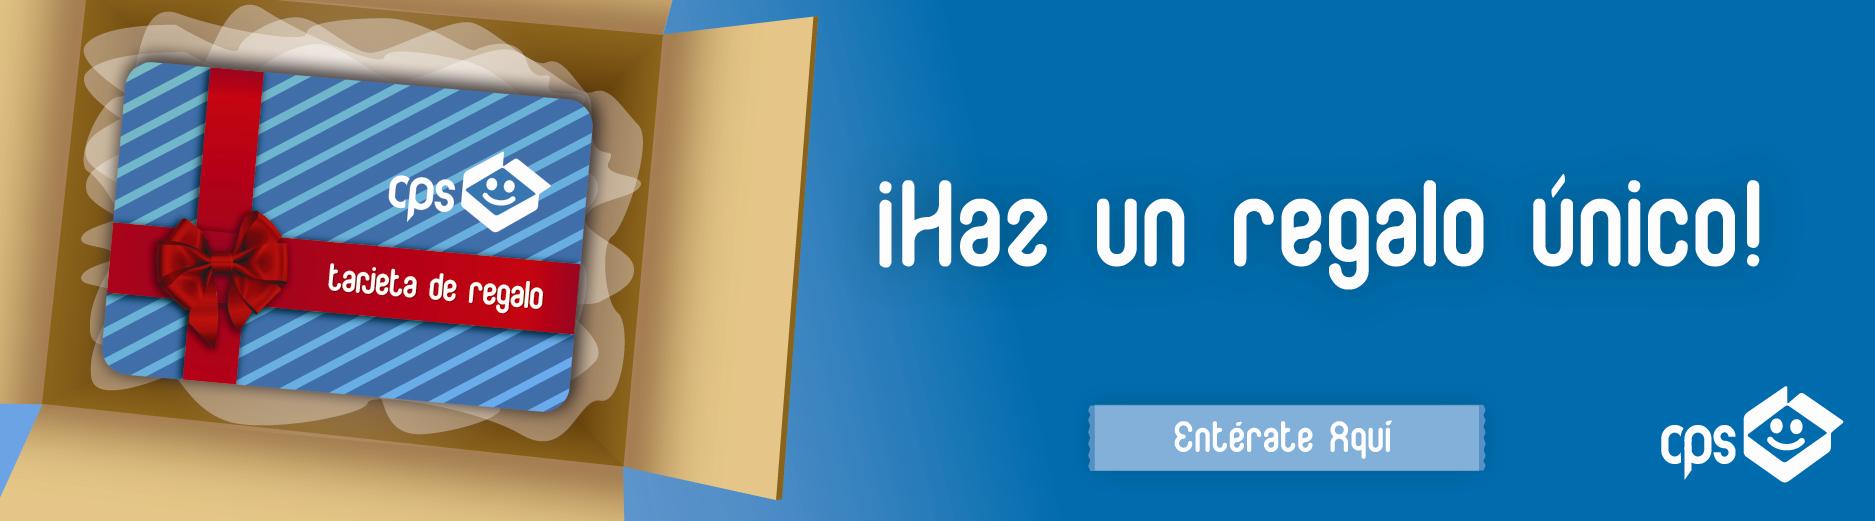 Banner Web Tarjeta de Regalo CPS-01